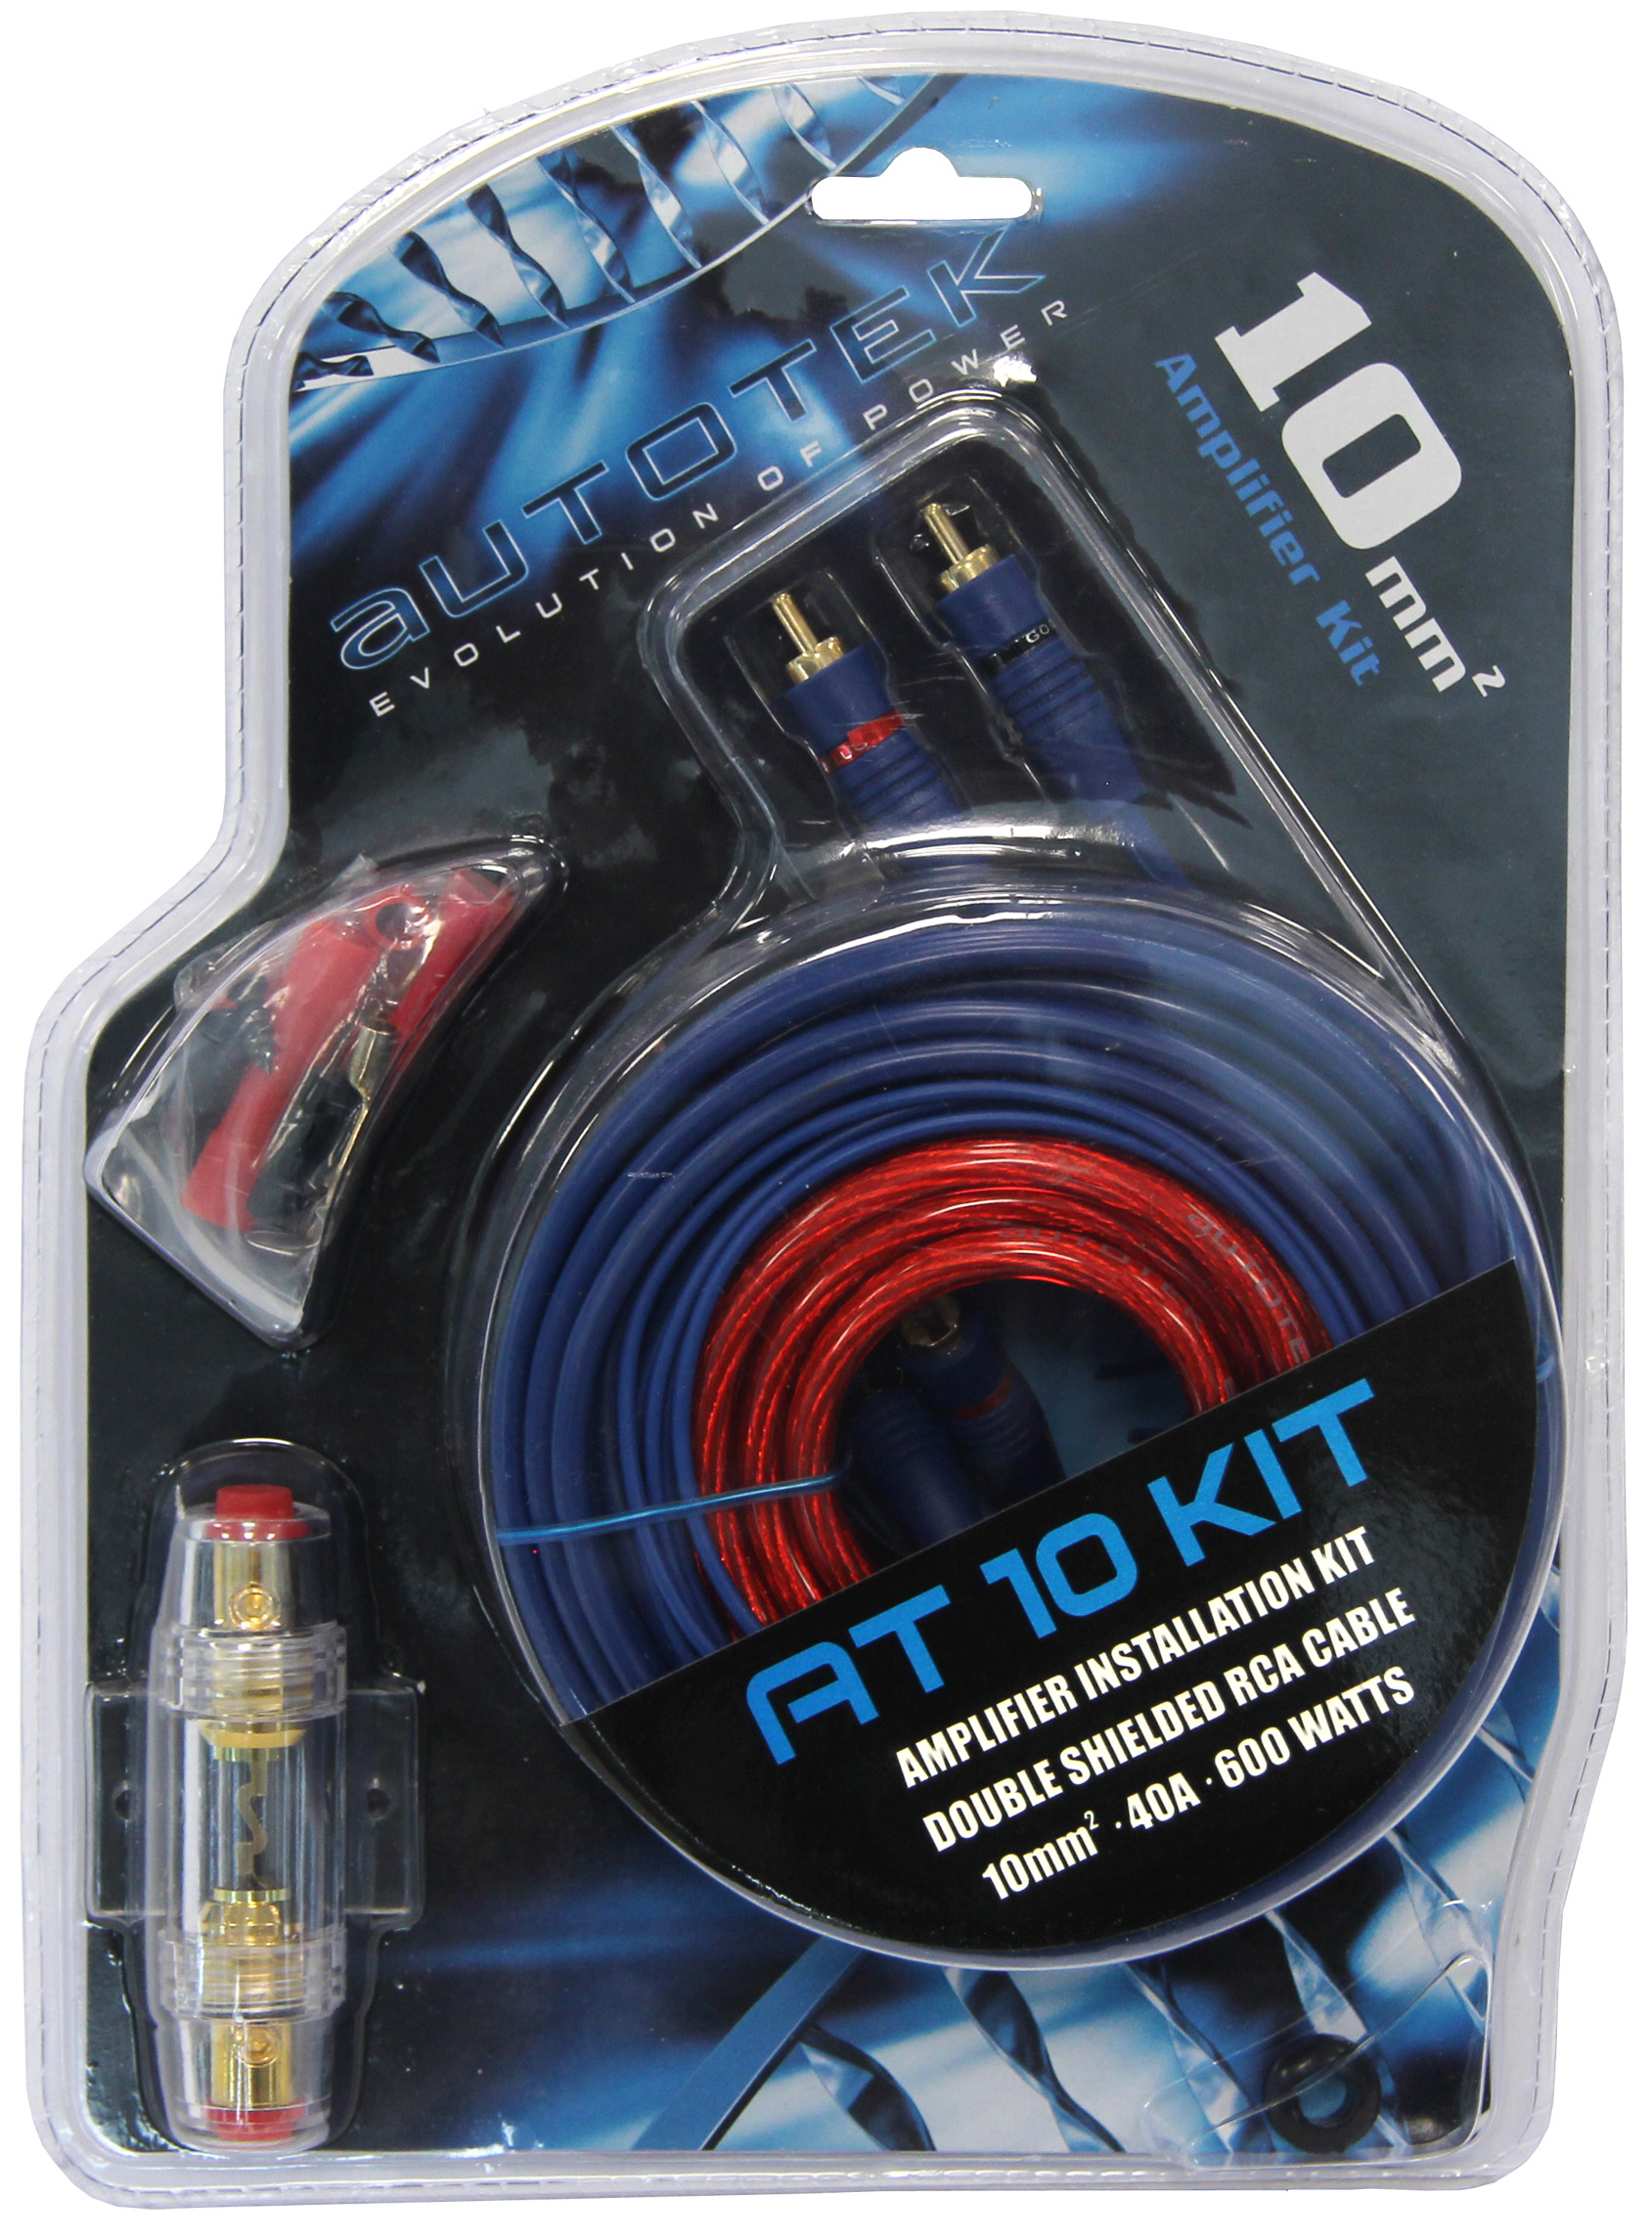 AUTOTEK AT10 10mm² Endstufe Verstärker Anschluss Set Amplifier Auto Kabel Kit